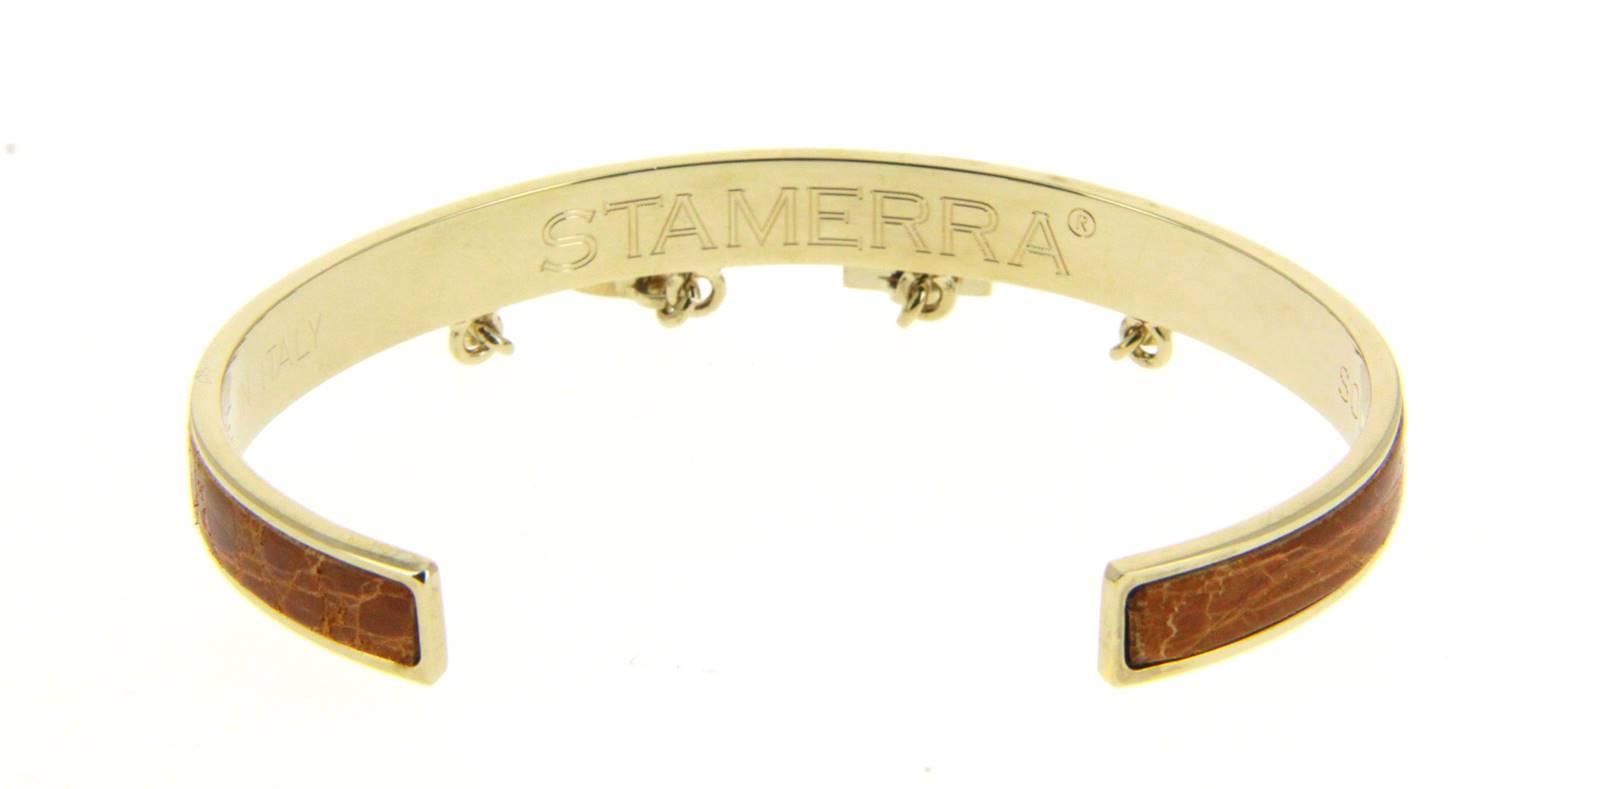 Stamerra bracelet VERO GENUINE CROCO GOLD MIELE